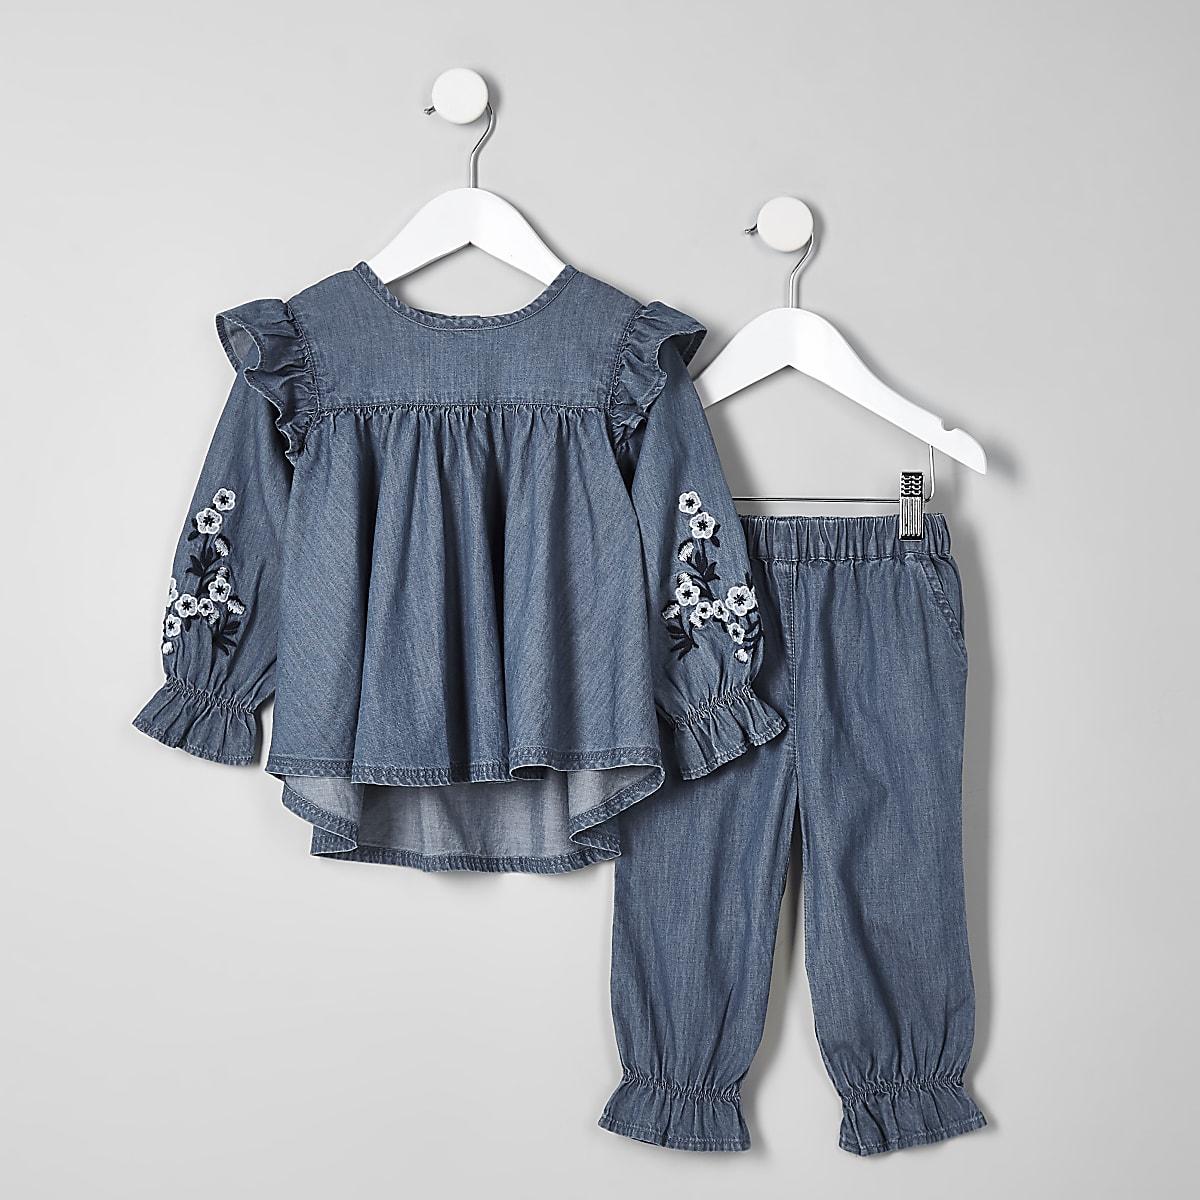 Mini girls blue denim swing top outfit